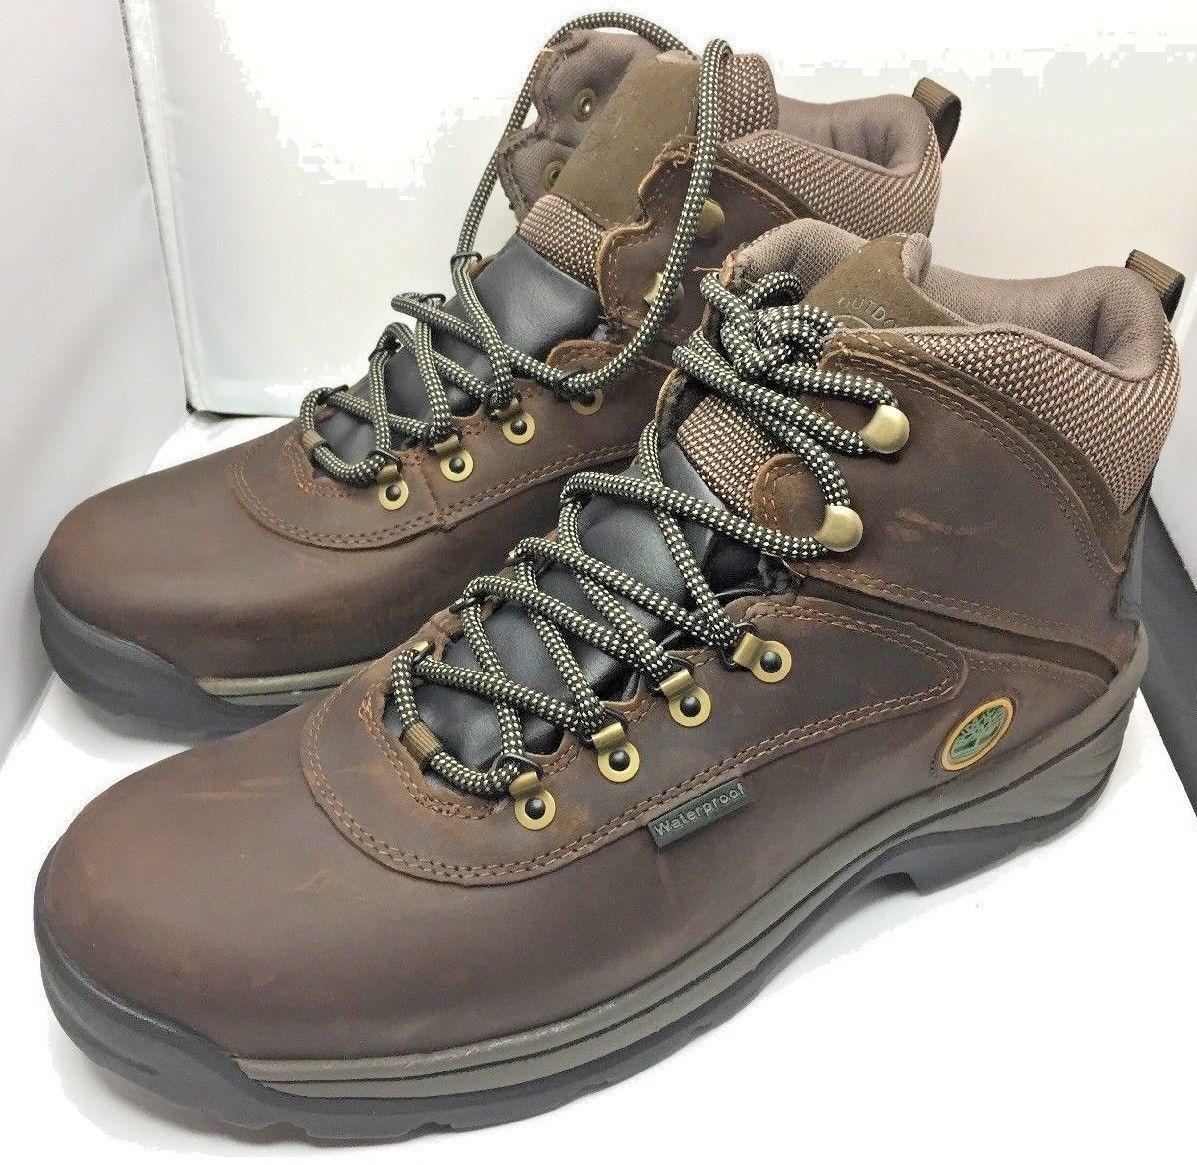 代购Timberland添柏岚男款白色Ledge Mid防水靴子-棕色13 M US